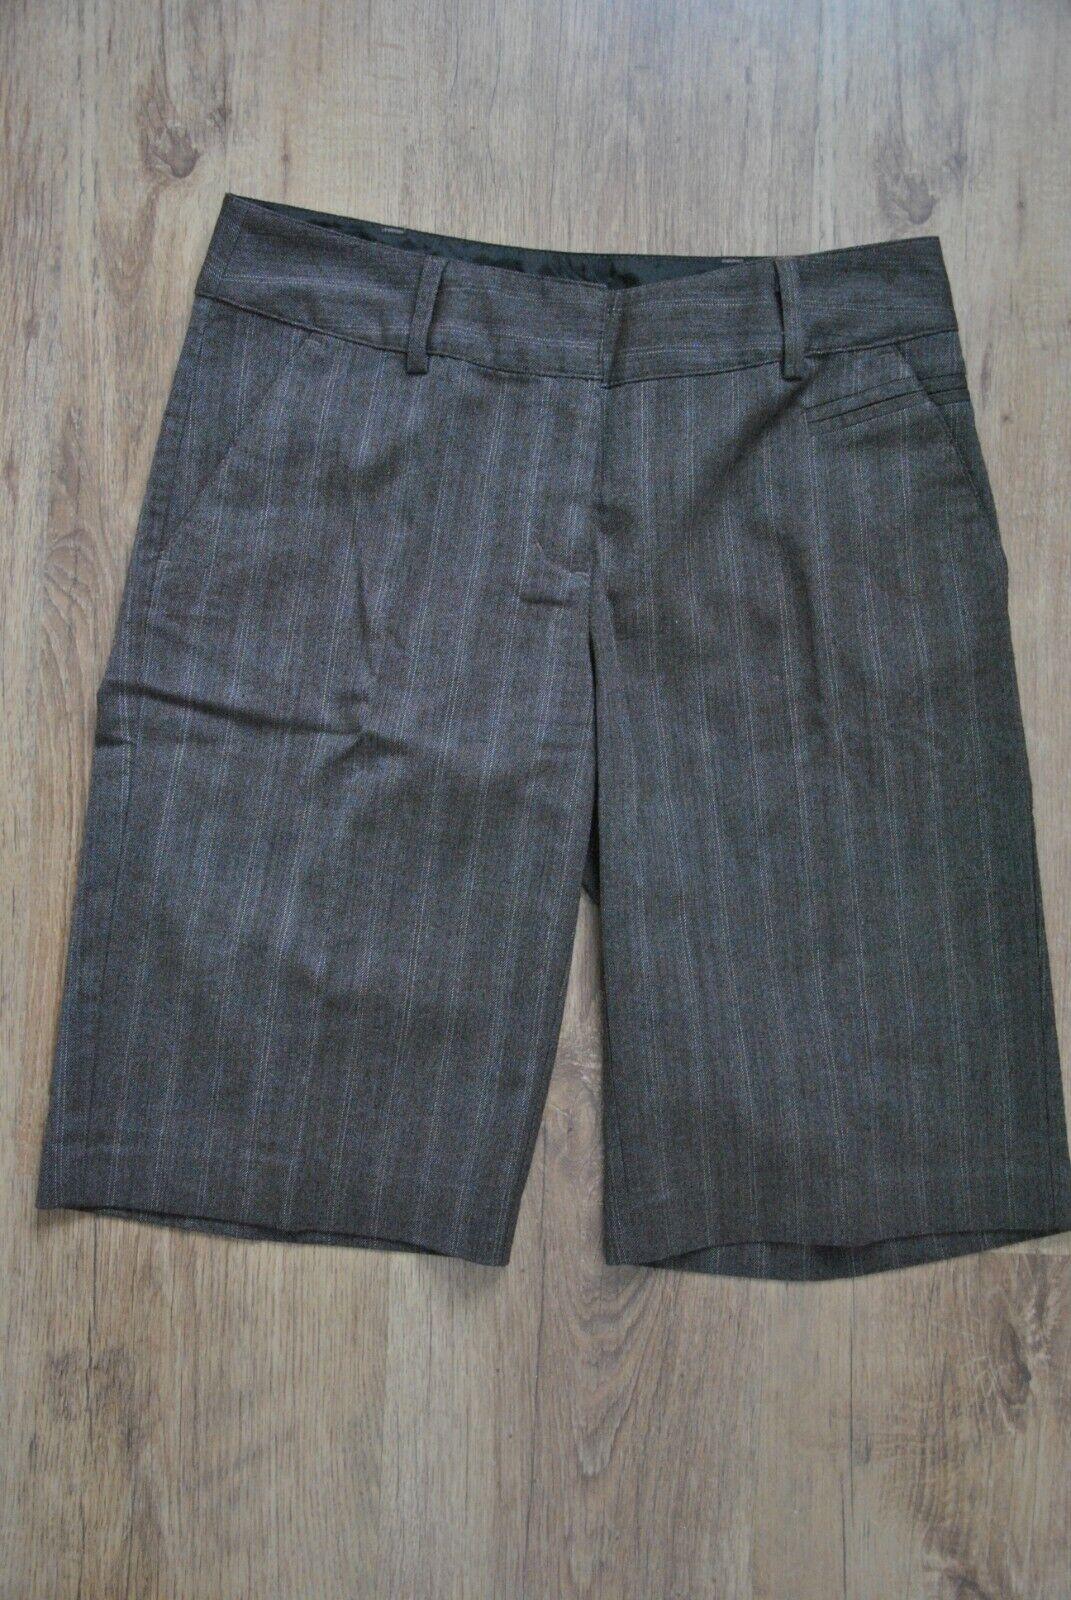 Vero Moda Gr. 36/ S Business Bermuda Shorts Braun Nadelstreifen